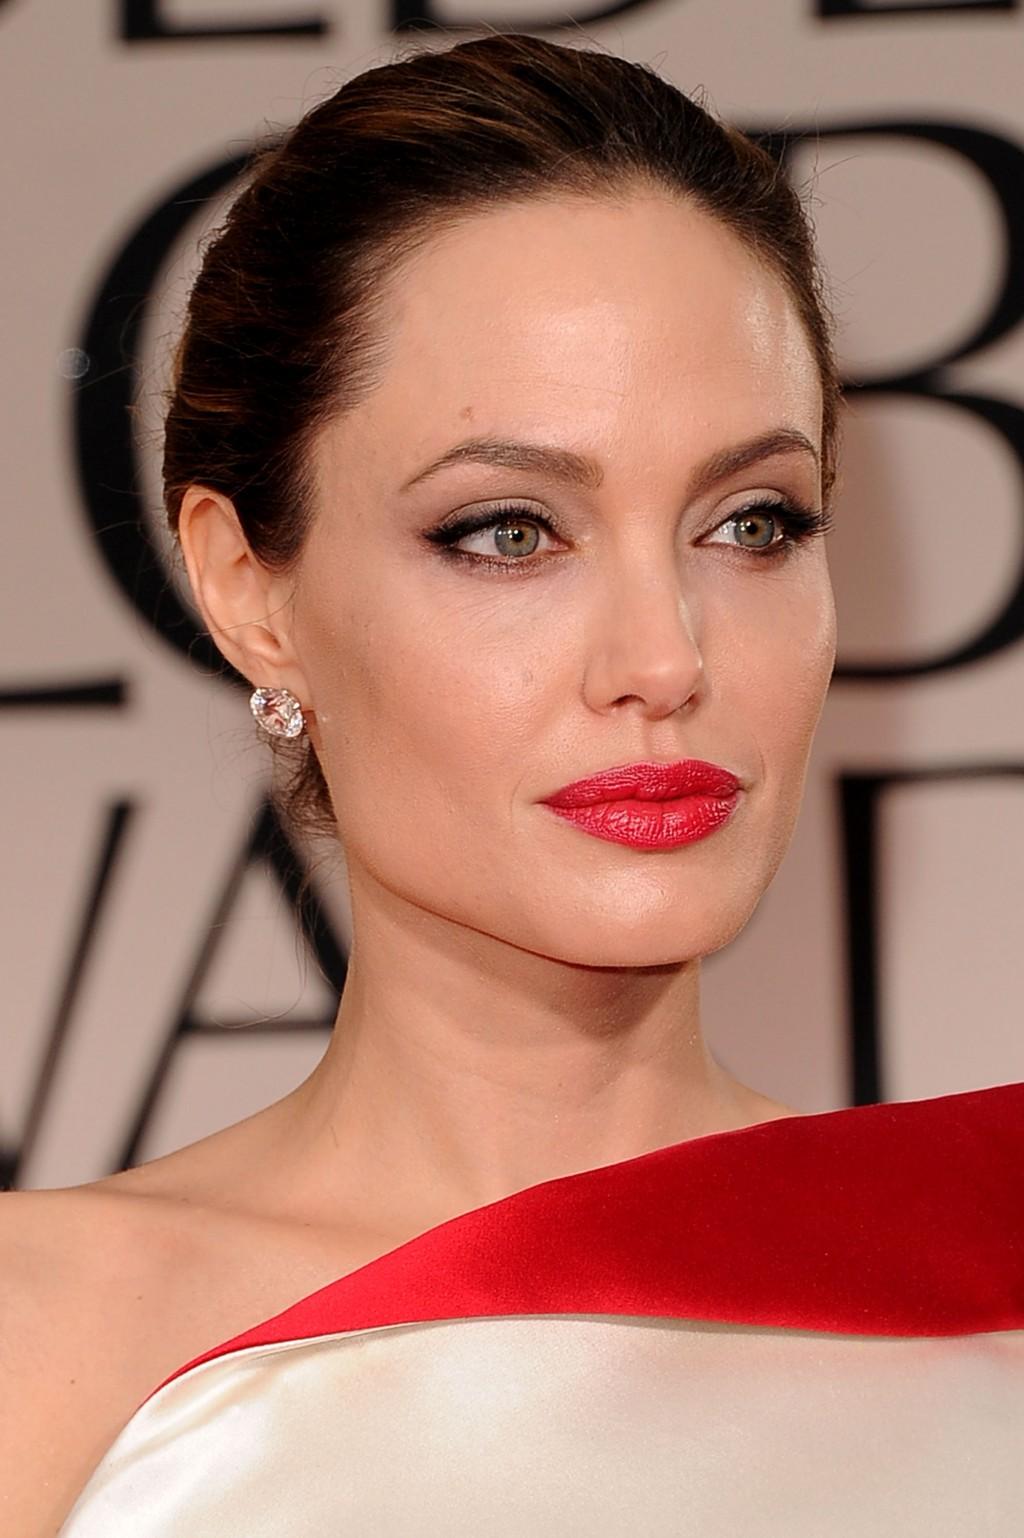 92456f4a818f471 Макияж под красное платье (36 фото): вечерний make-up для брюнеток ...